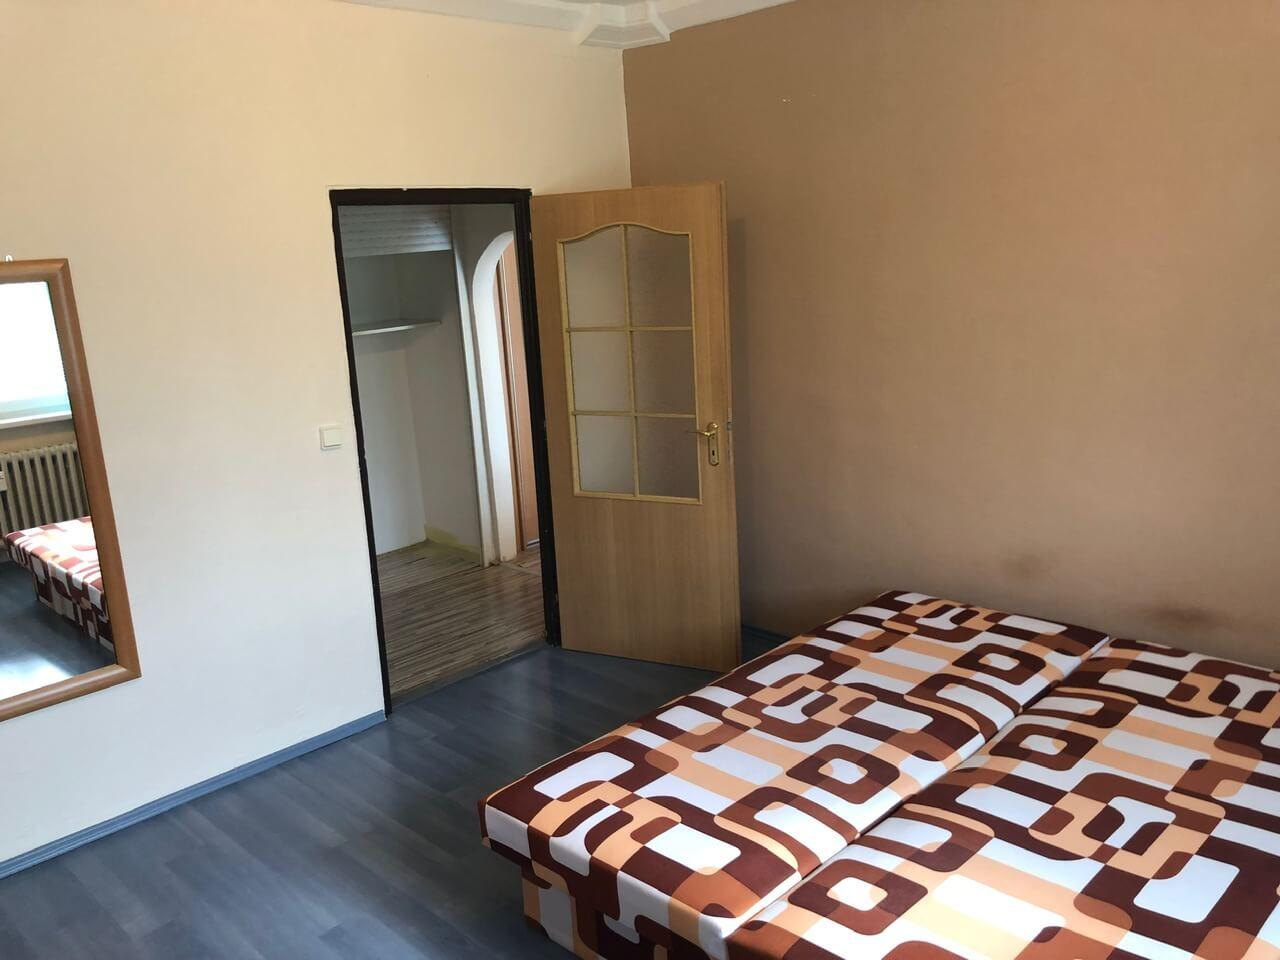 3 izbový byt, Račianska 85, 63m2, balkon 10m2, výborná lokalita-32